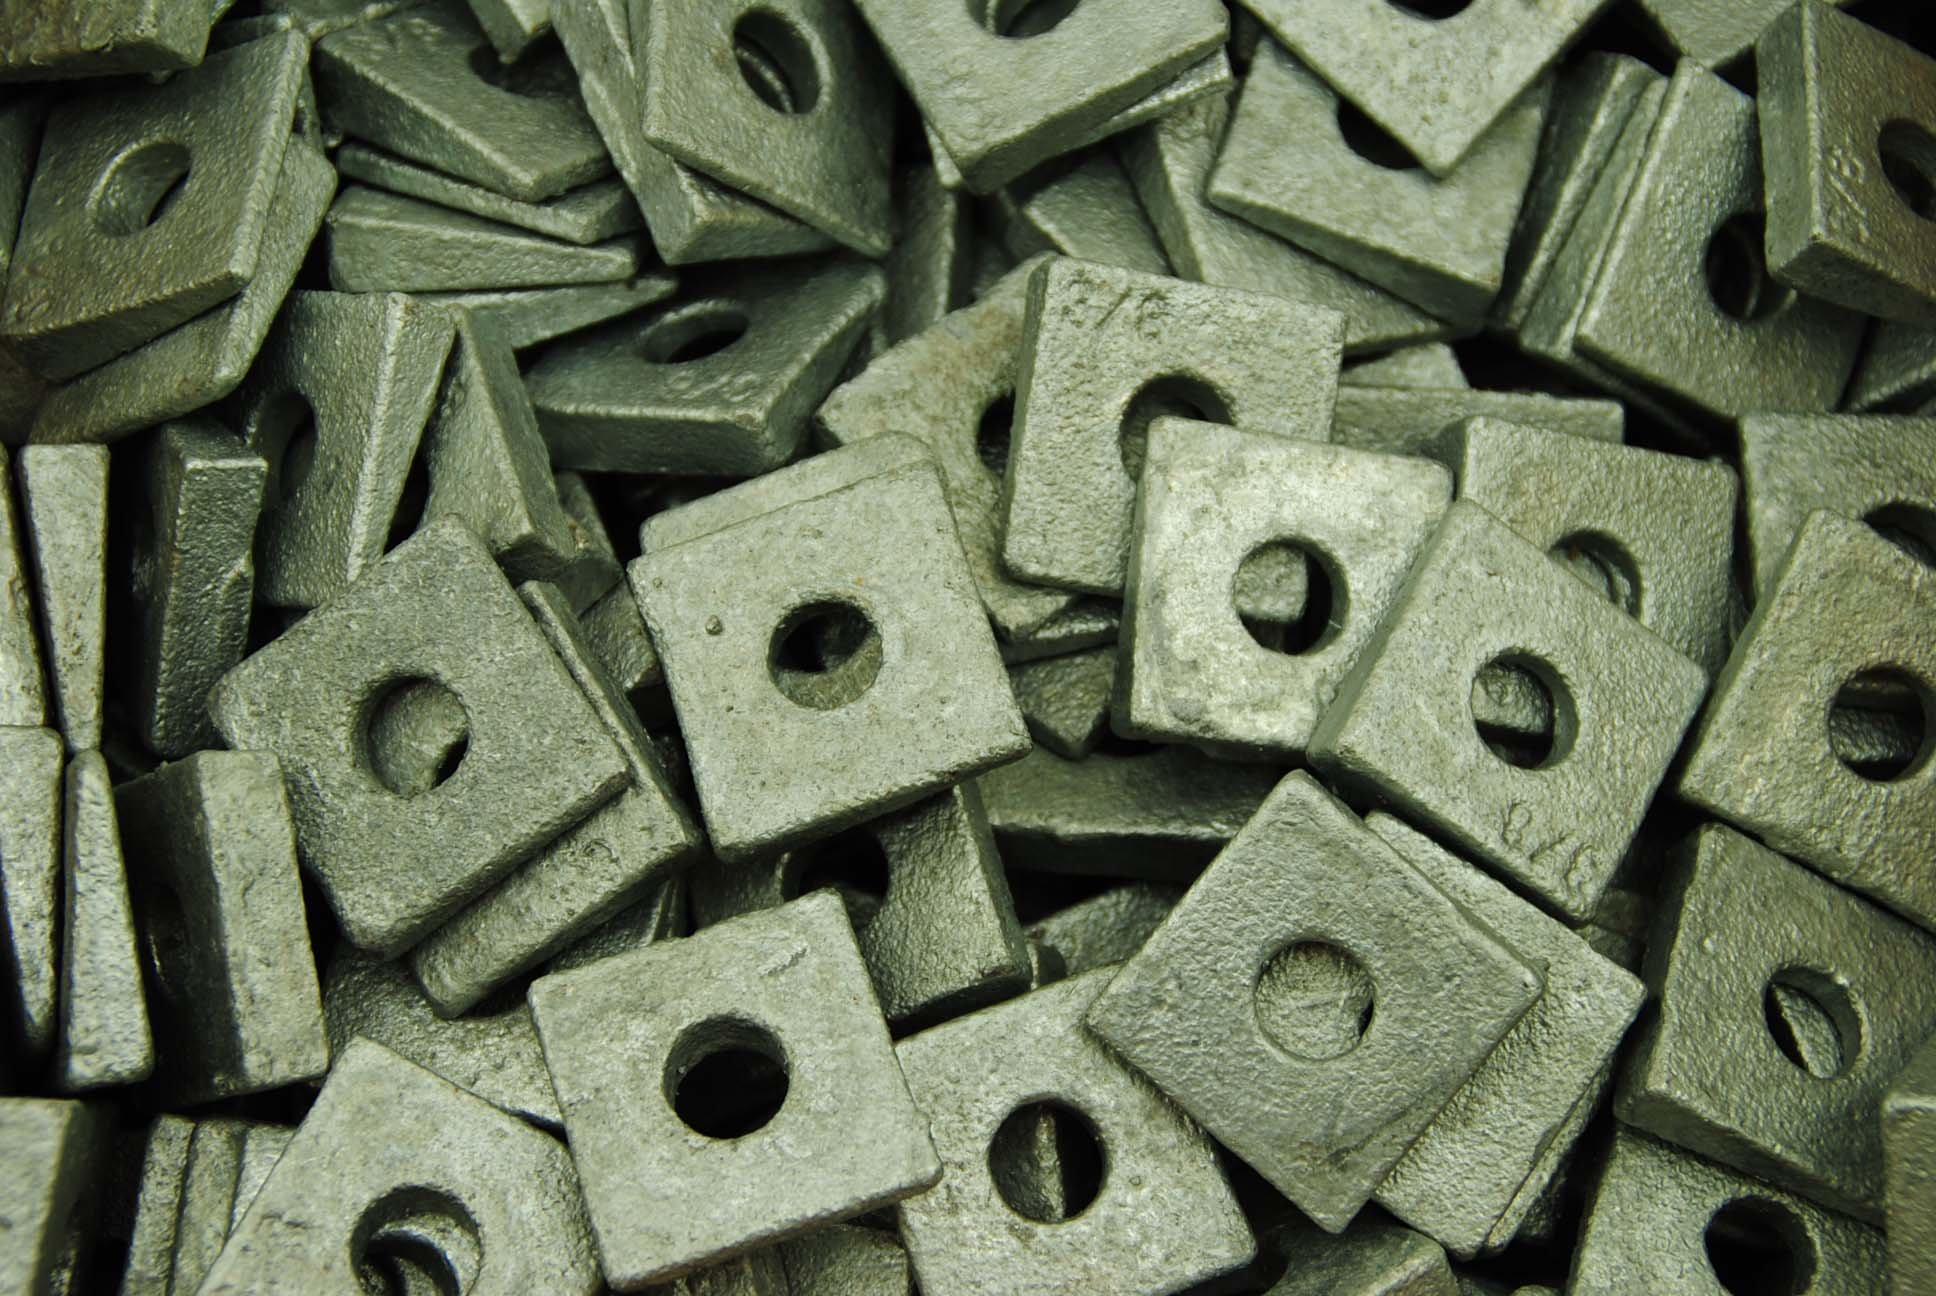 20 Galvanized Malleable 1 Square Bevel Washers I-Beam Flange Wedge 1